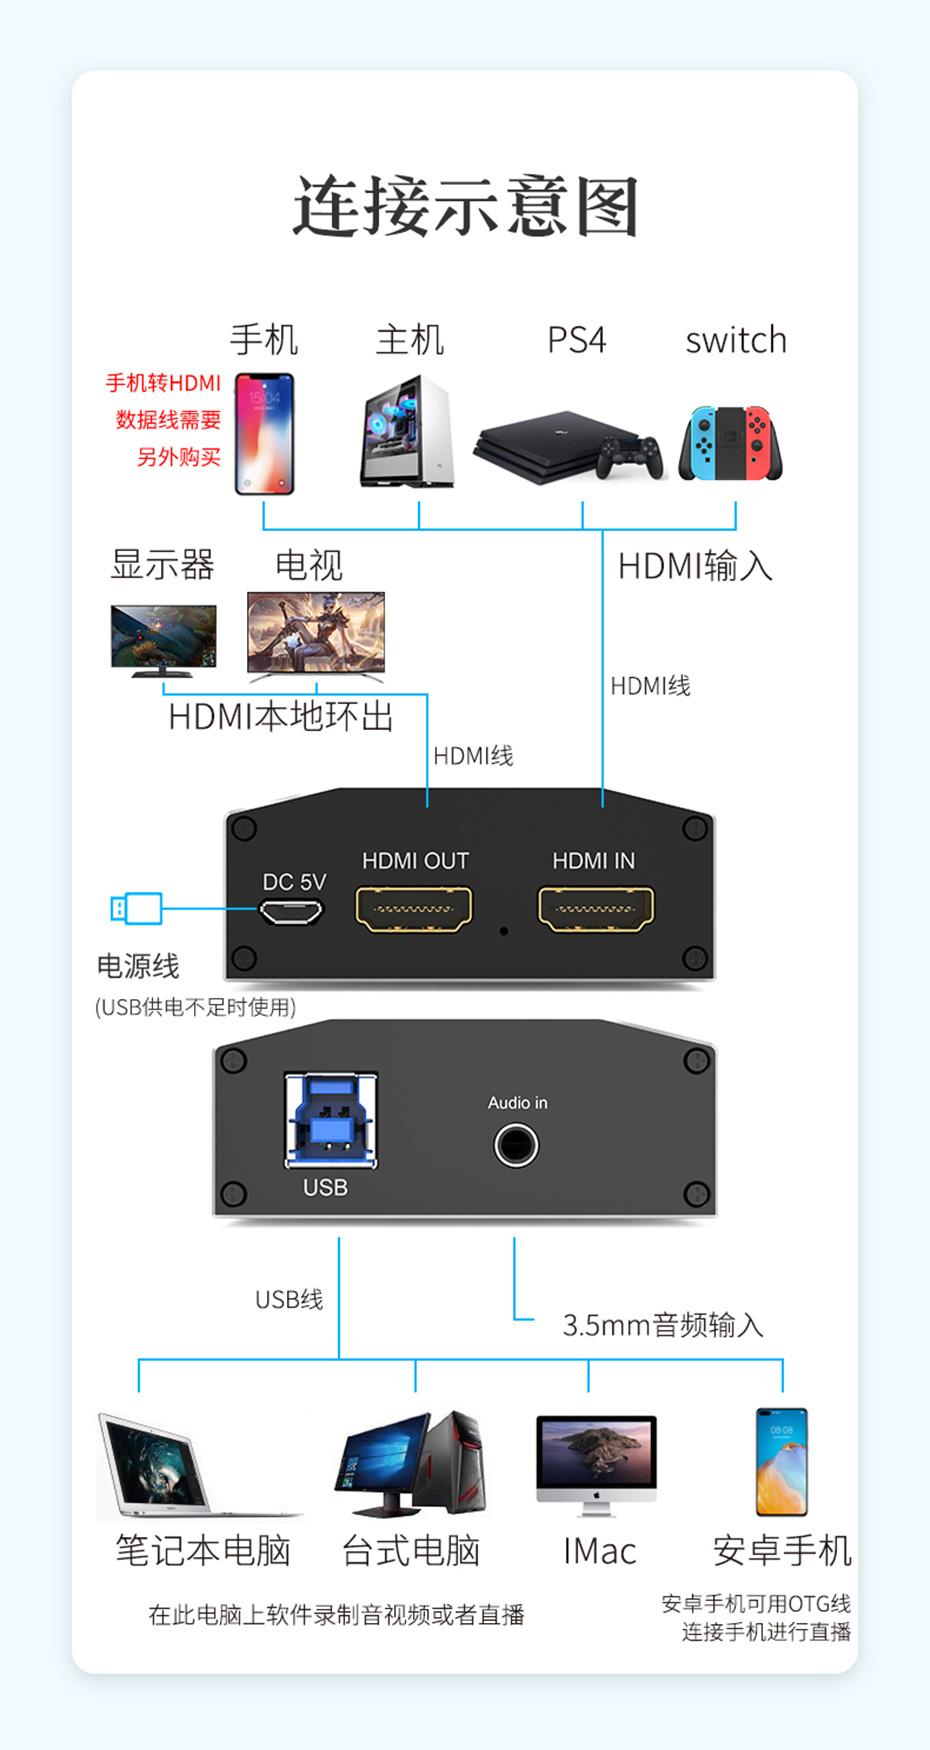 USB HDMI采集卡1805连接使用示意图